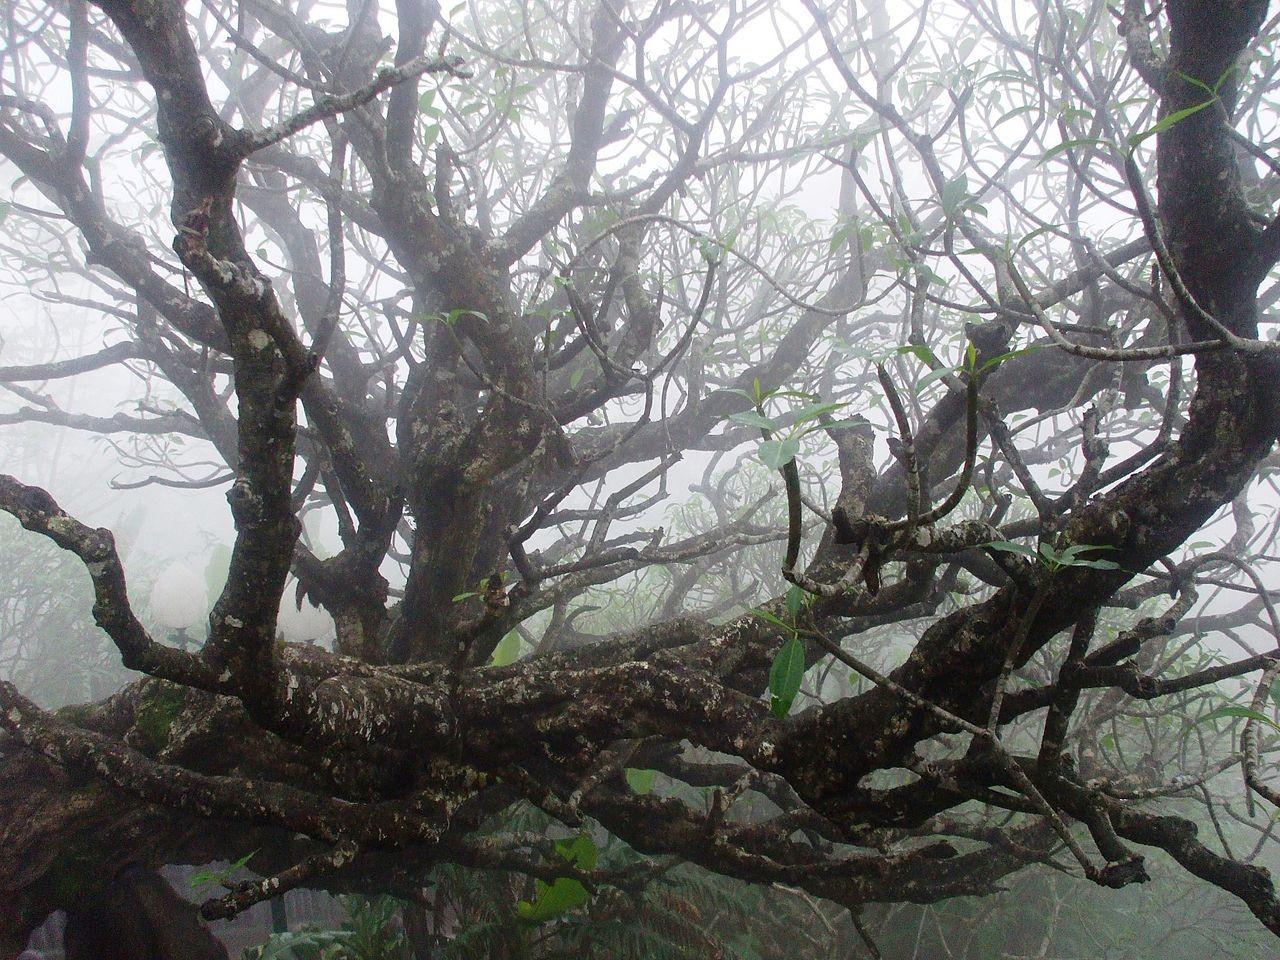 Vietnam natural landscape_Yen Tu Mountain